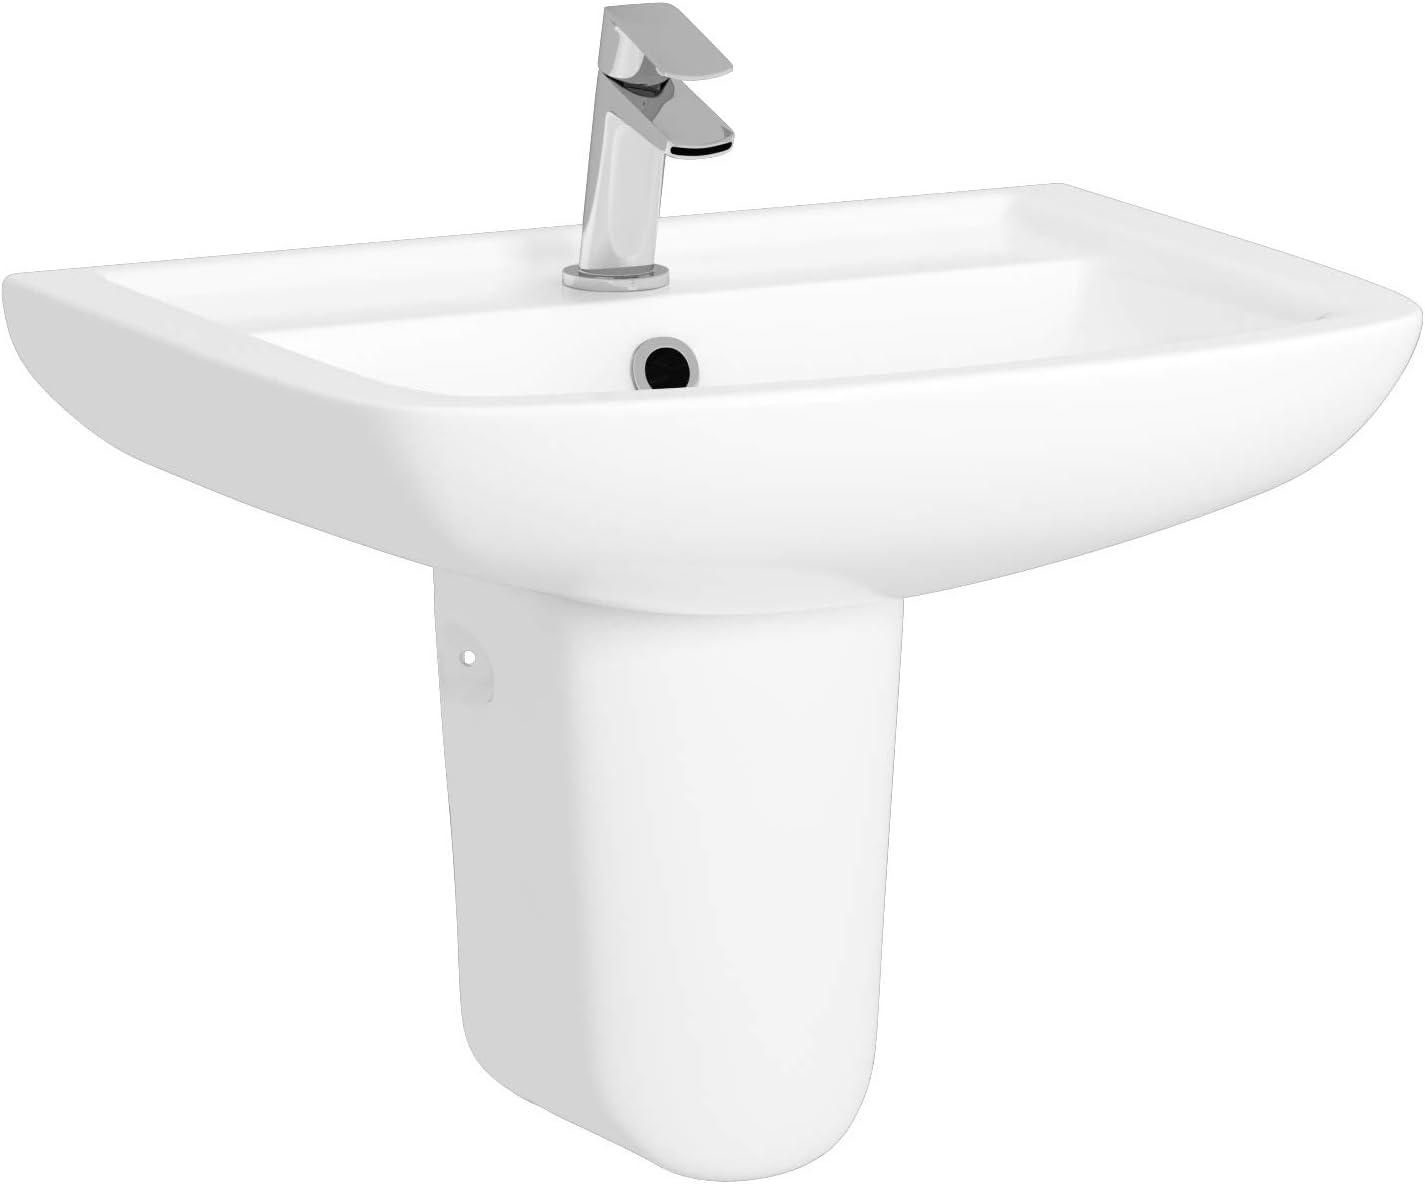 610mm Semi Pedestal Basin Seat Bathroom Suite Cistern Bathroom Suite Cube Rimless Close Coupled Toilet